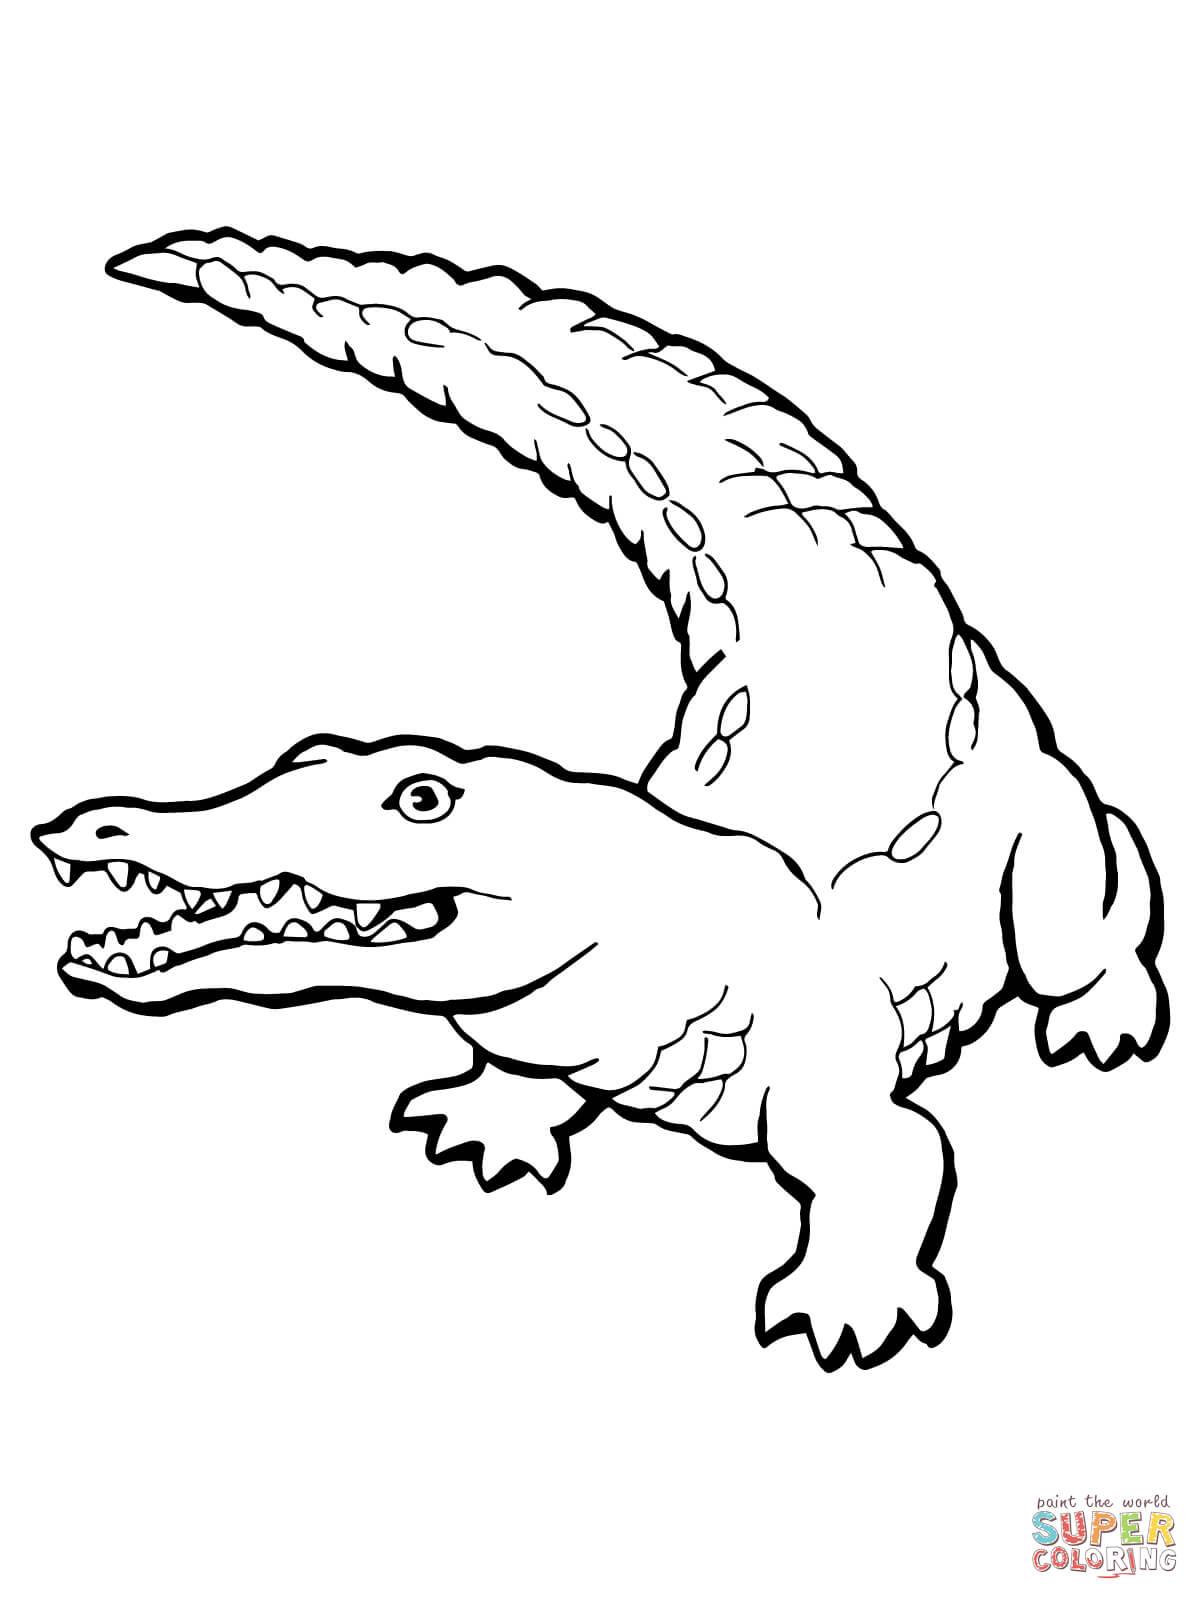 Ausmalbild Realistisches Krokodil